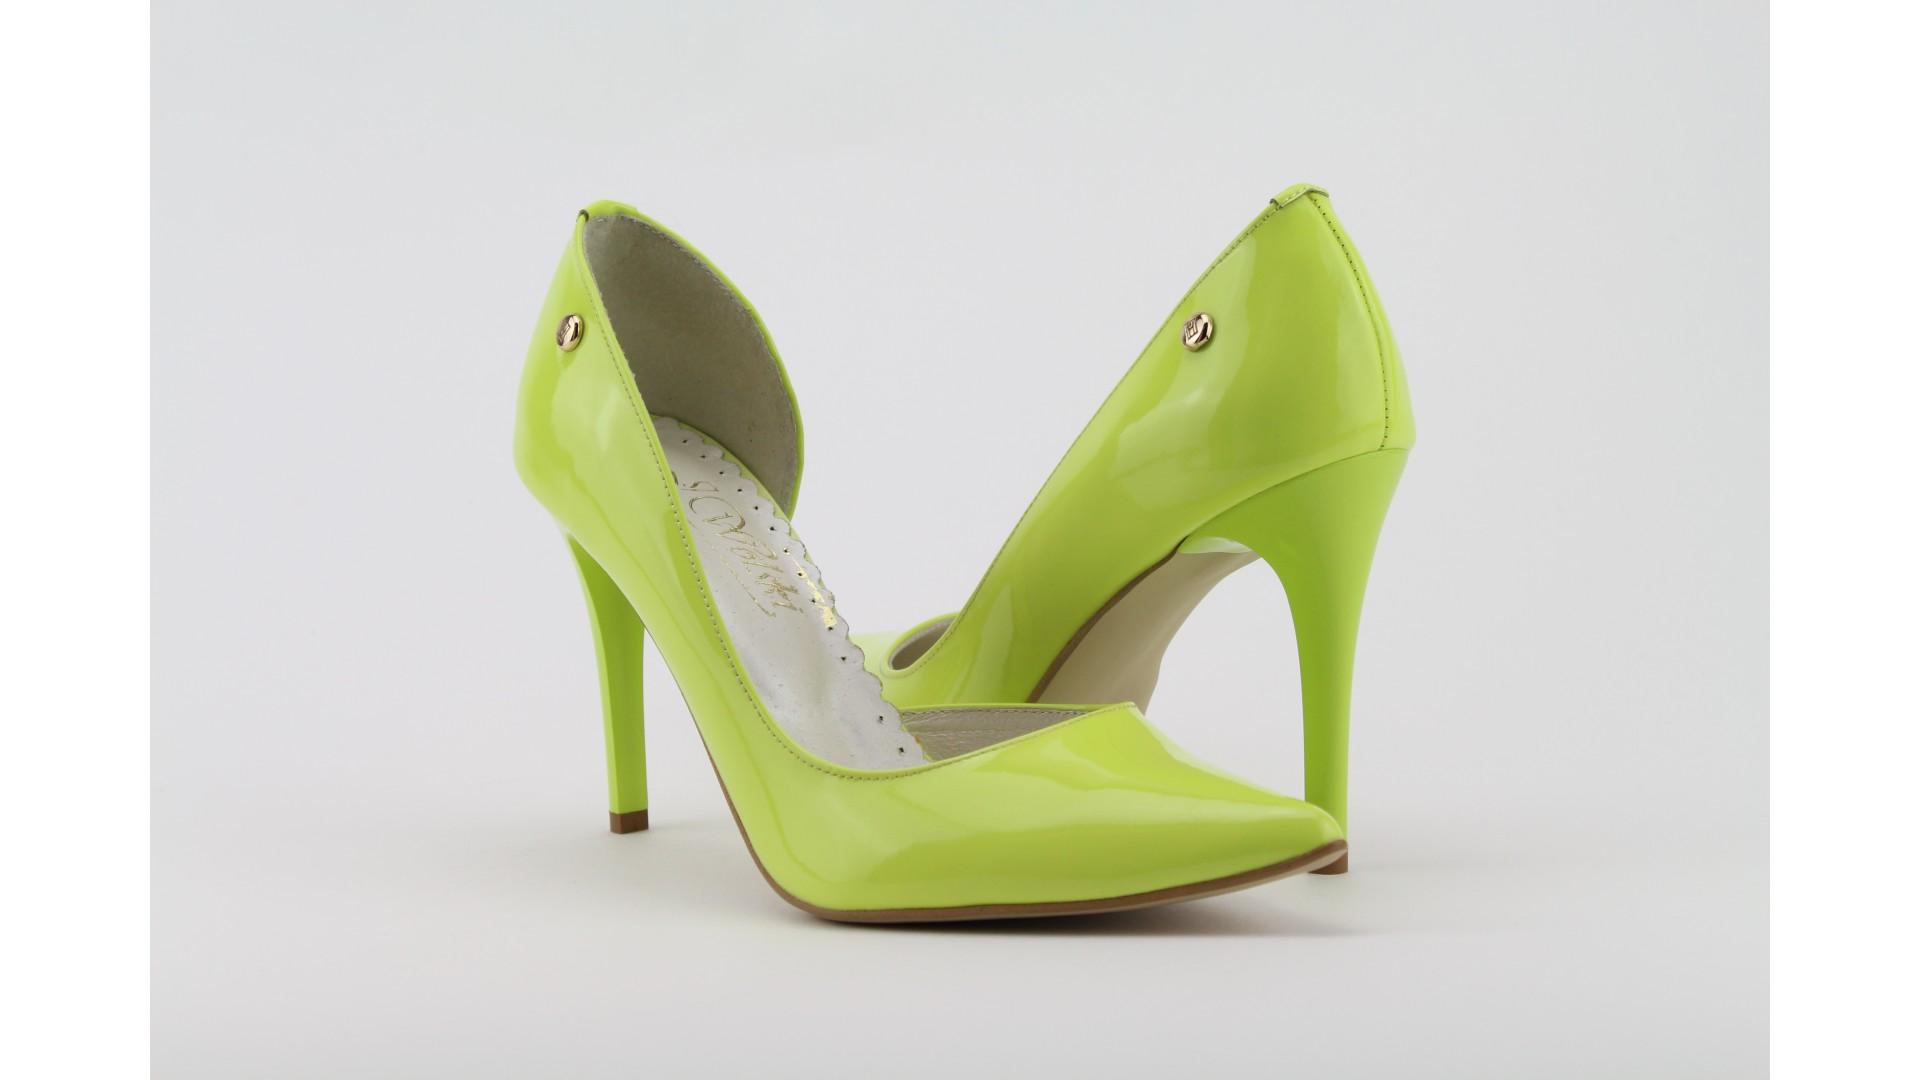 ae36ace024 WOLSKI neon sárga lakkbőr tűsarkú cipő